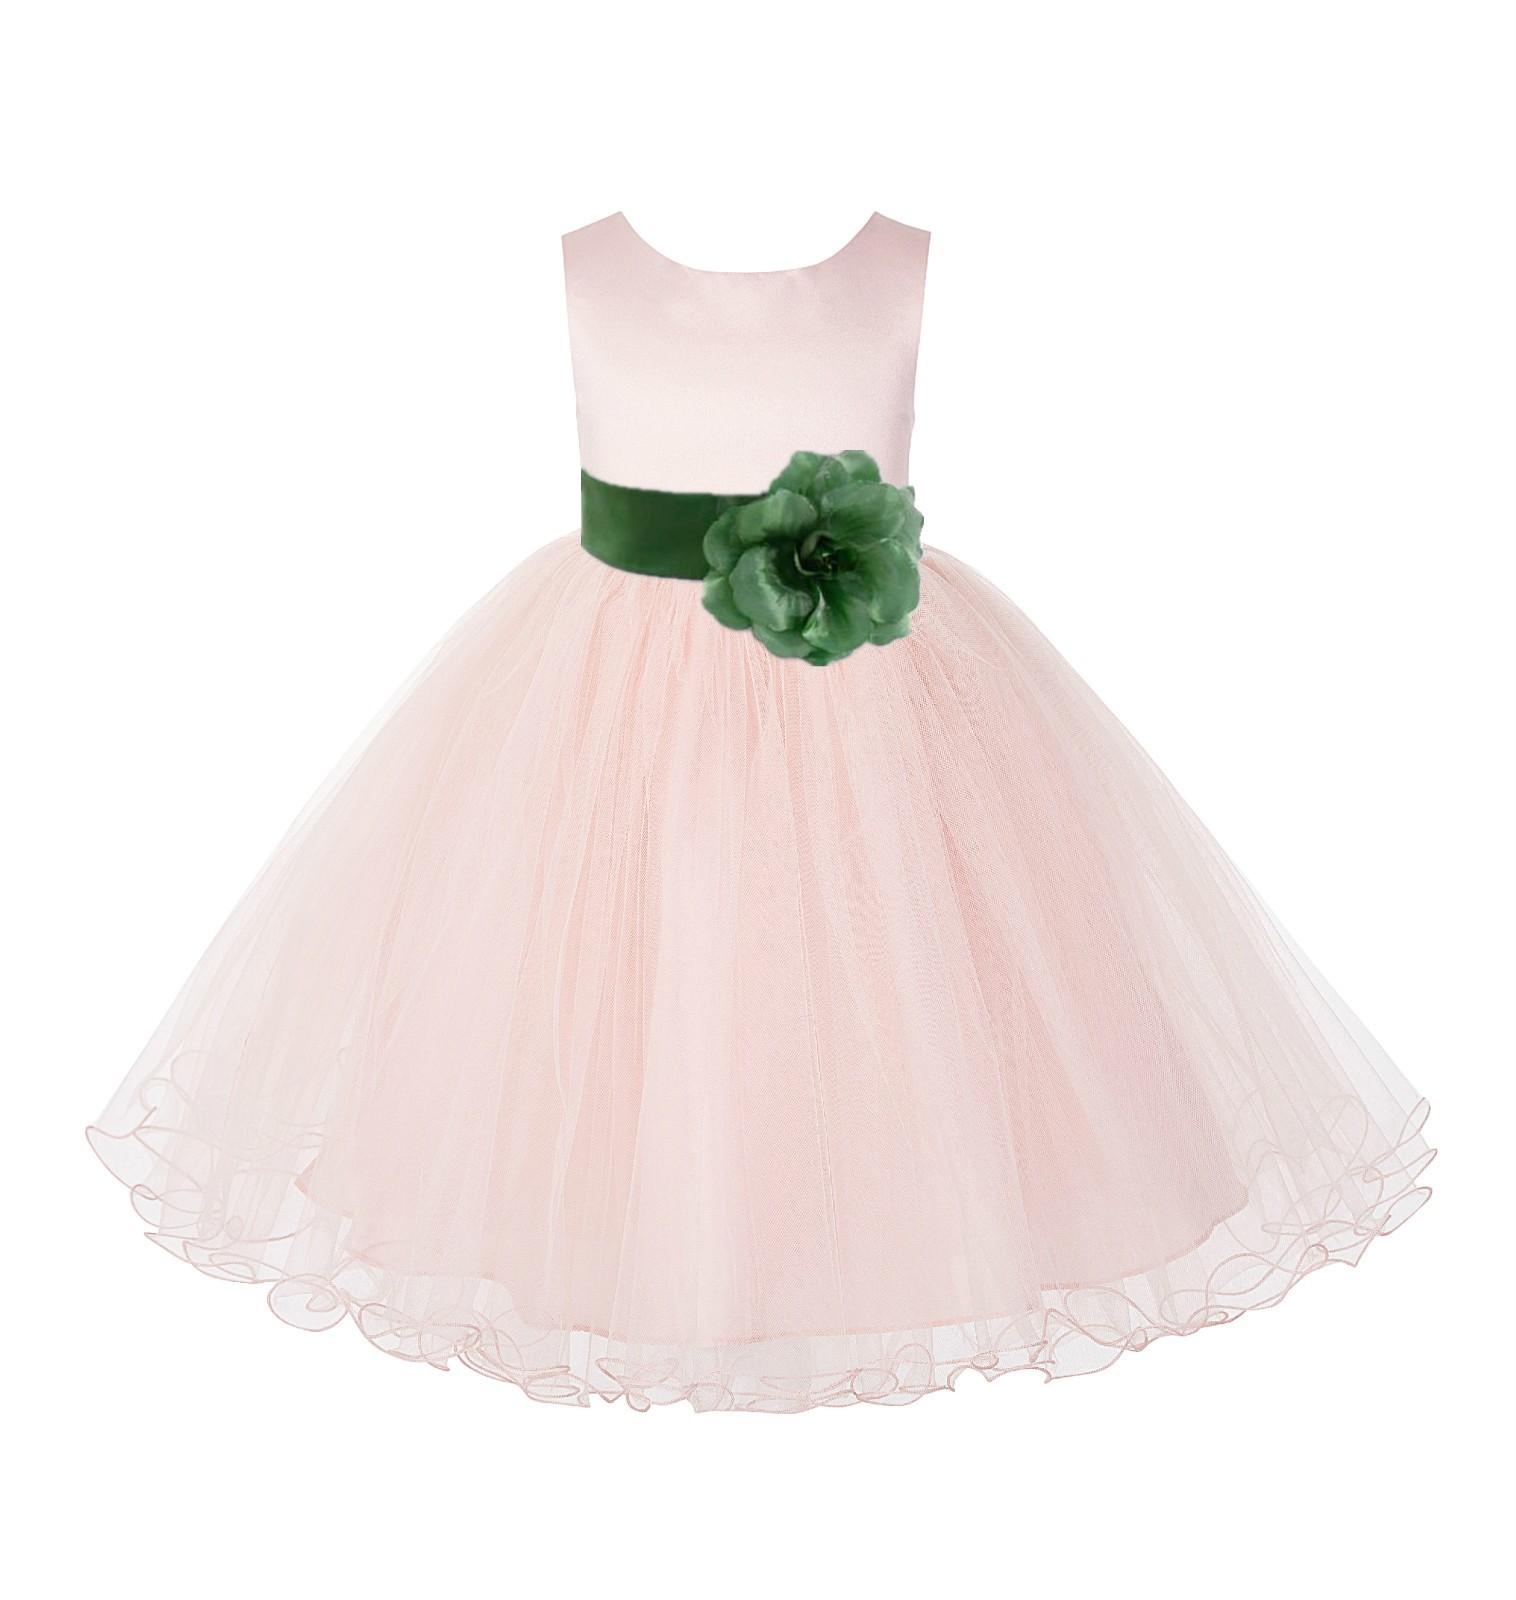 Blush Pink / Clover Tulle Rattail Edge Flower Girl Dress Pageant Recital 829S